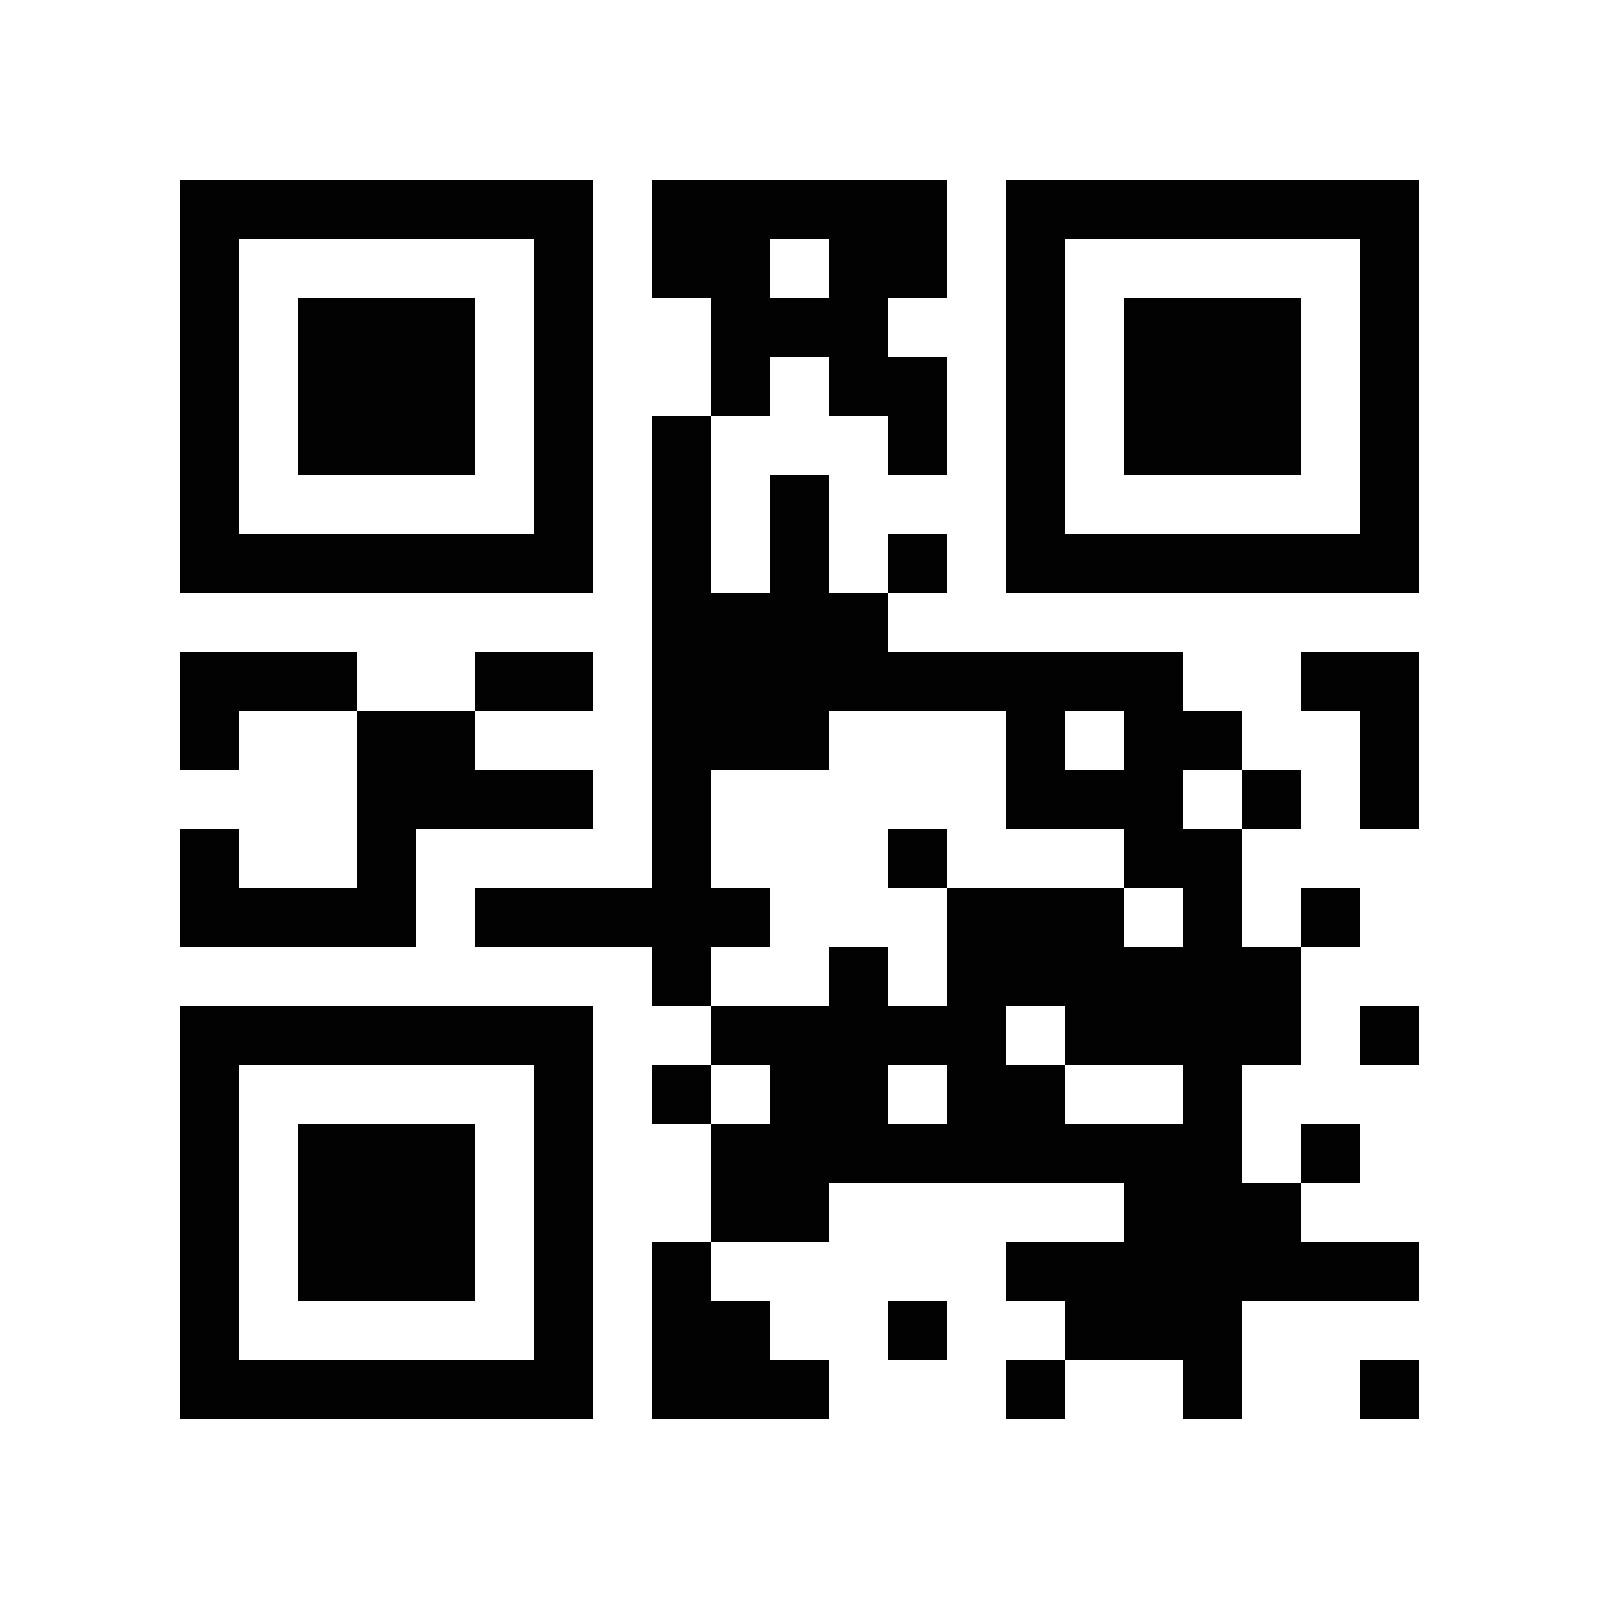 websiteqrcode noframe png